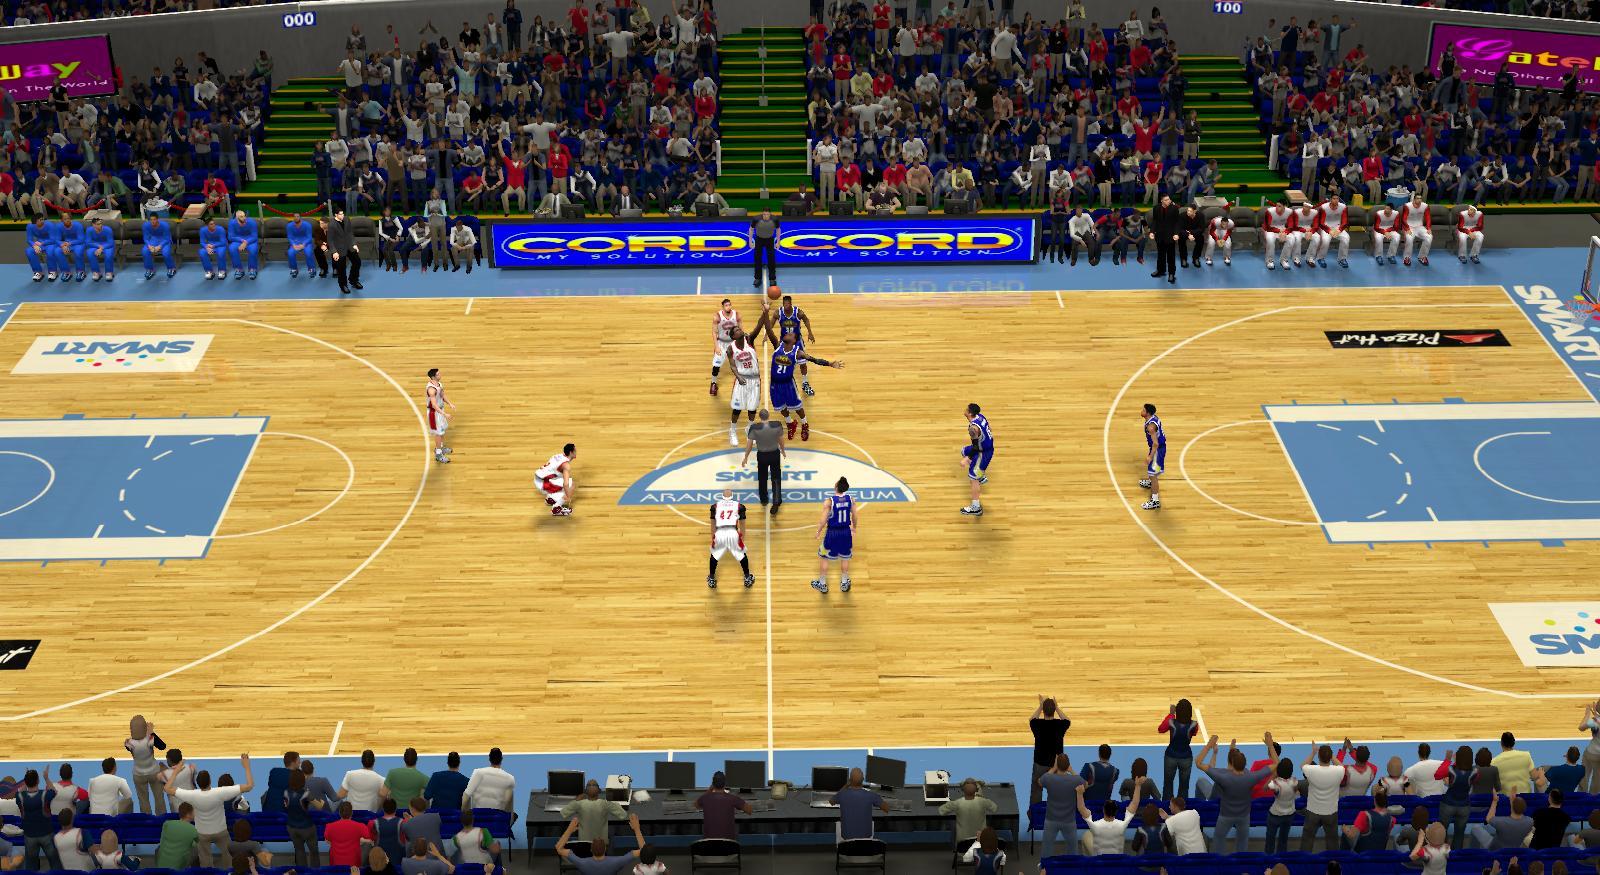 💄 Apkparadise org pba 2k17 | NBA 2K17 Free full pc game